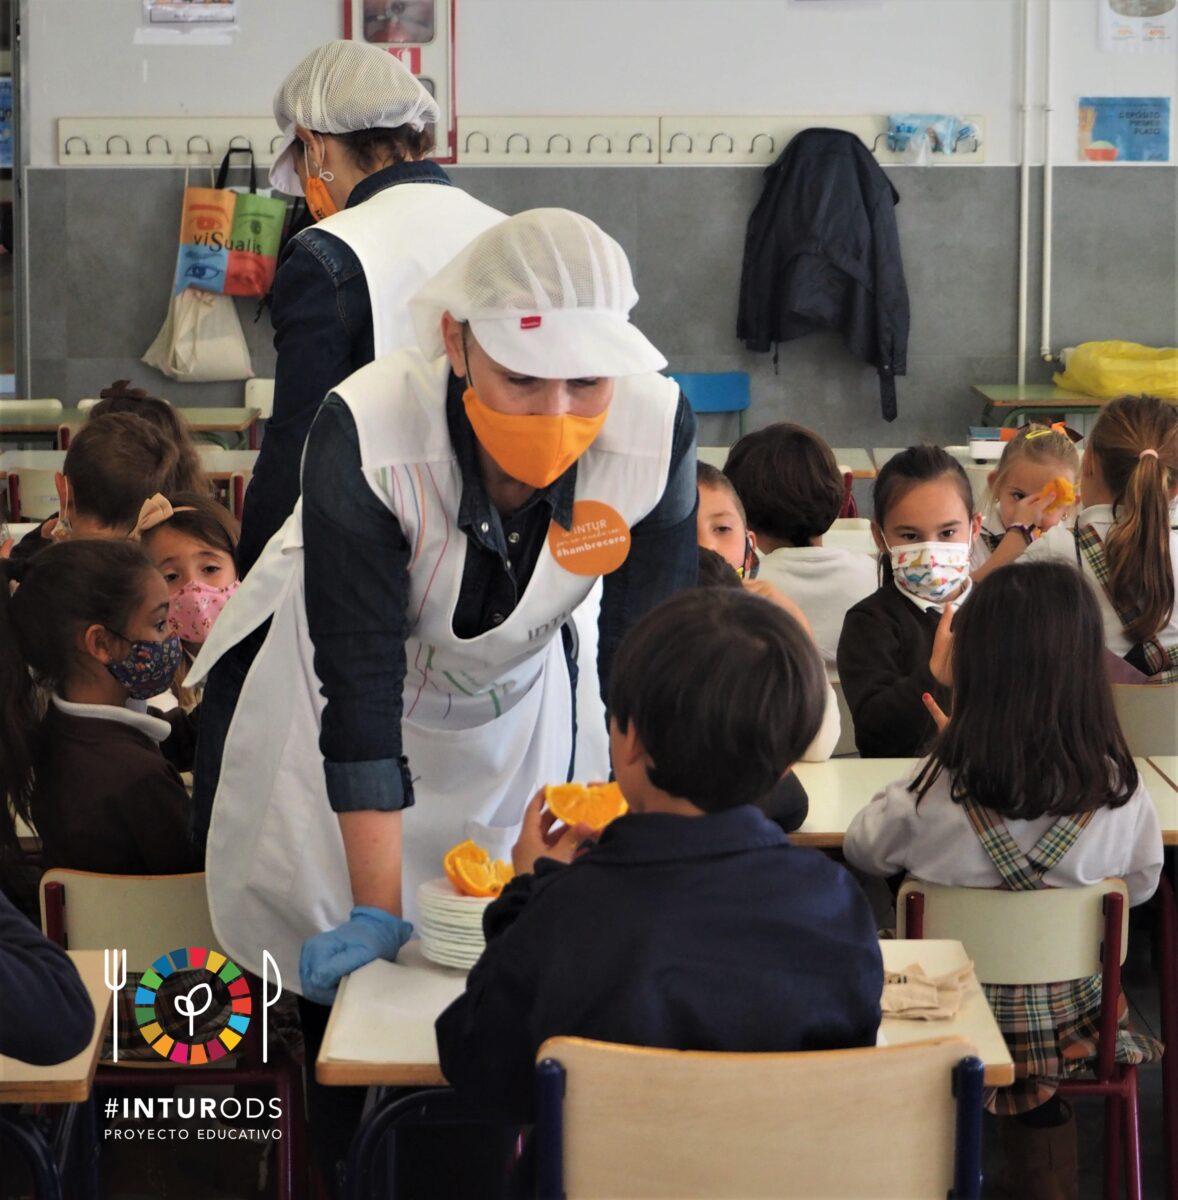 INTURODS Proyecto Educativo